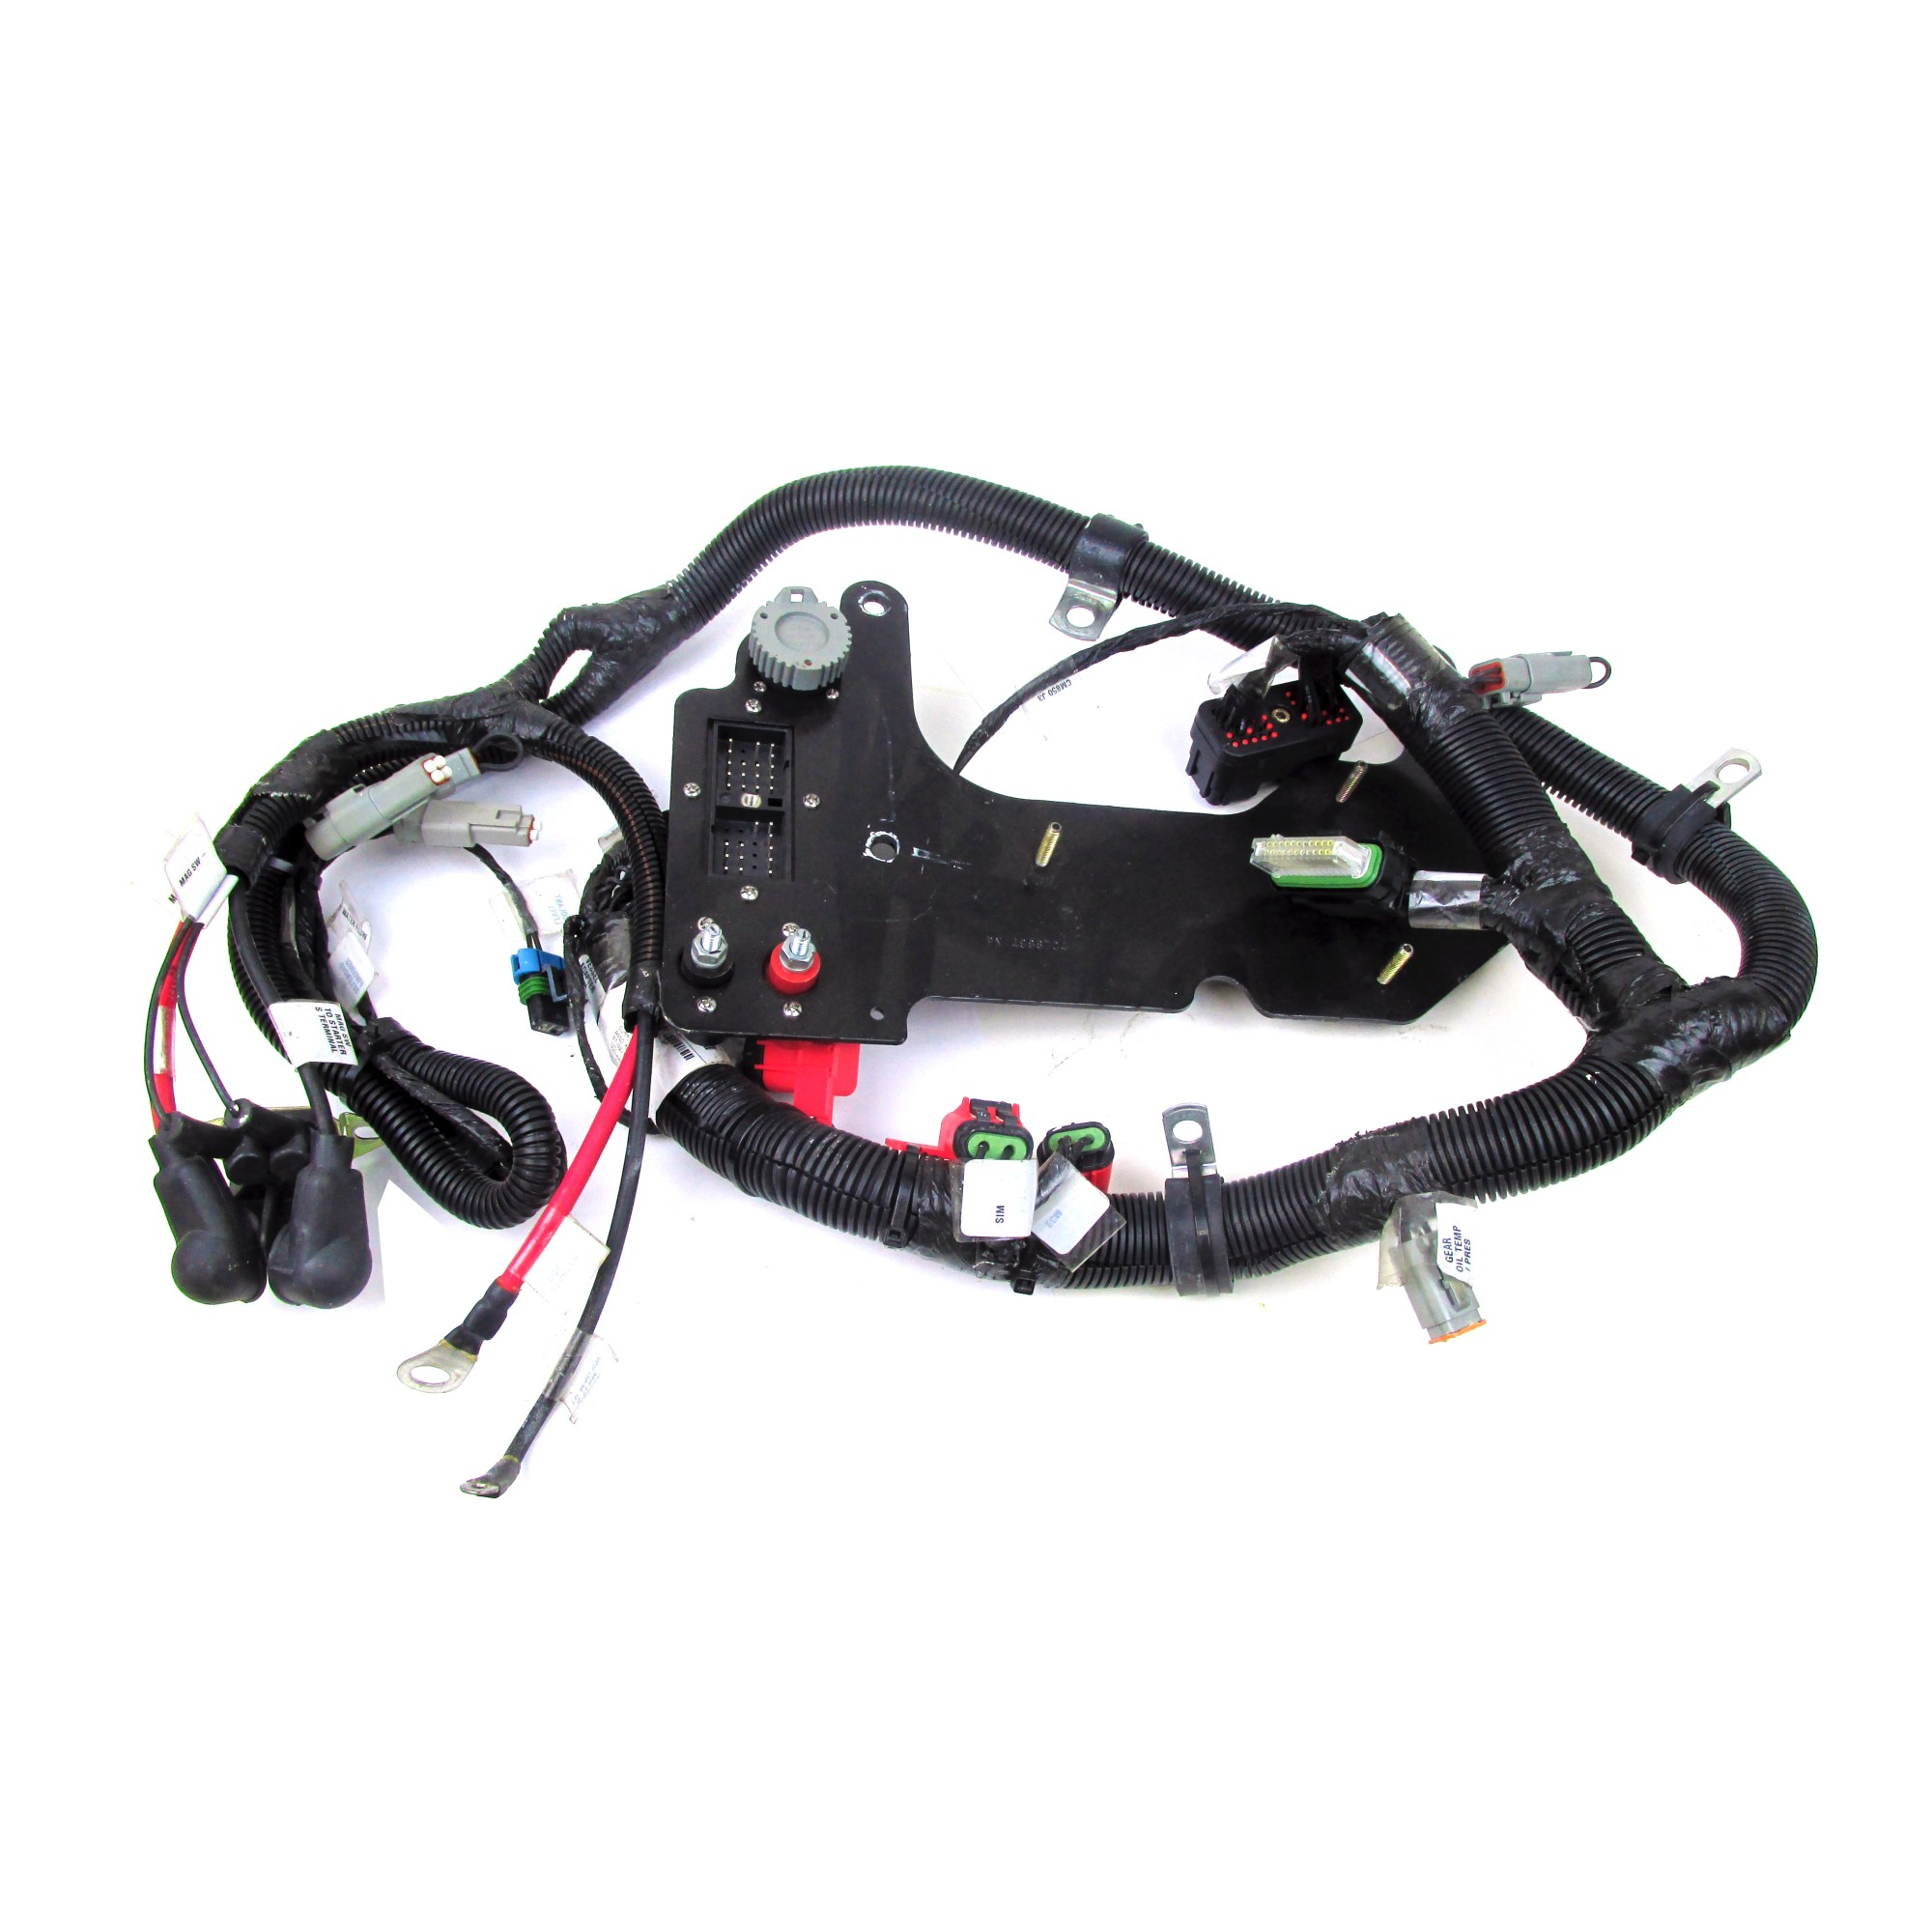 hight resolution of cummins marine cm850 qsc qsl smartcraft harness 4996703